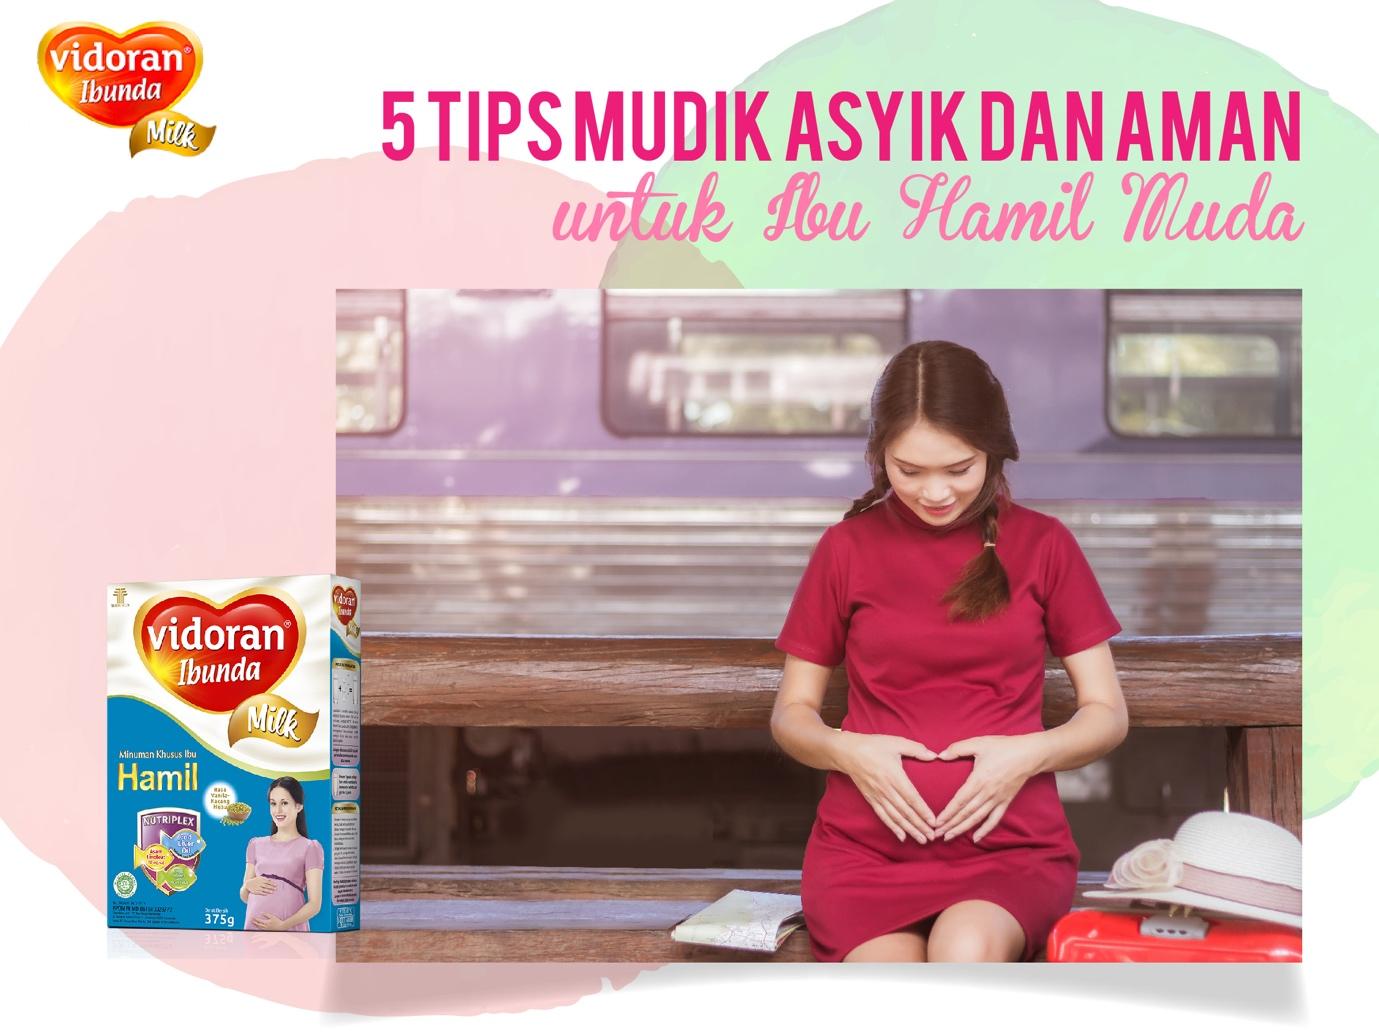 5 Tips Mudik Asyik dan Aman untuk Ibu Hamil Muda